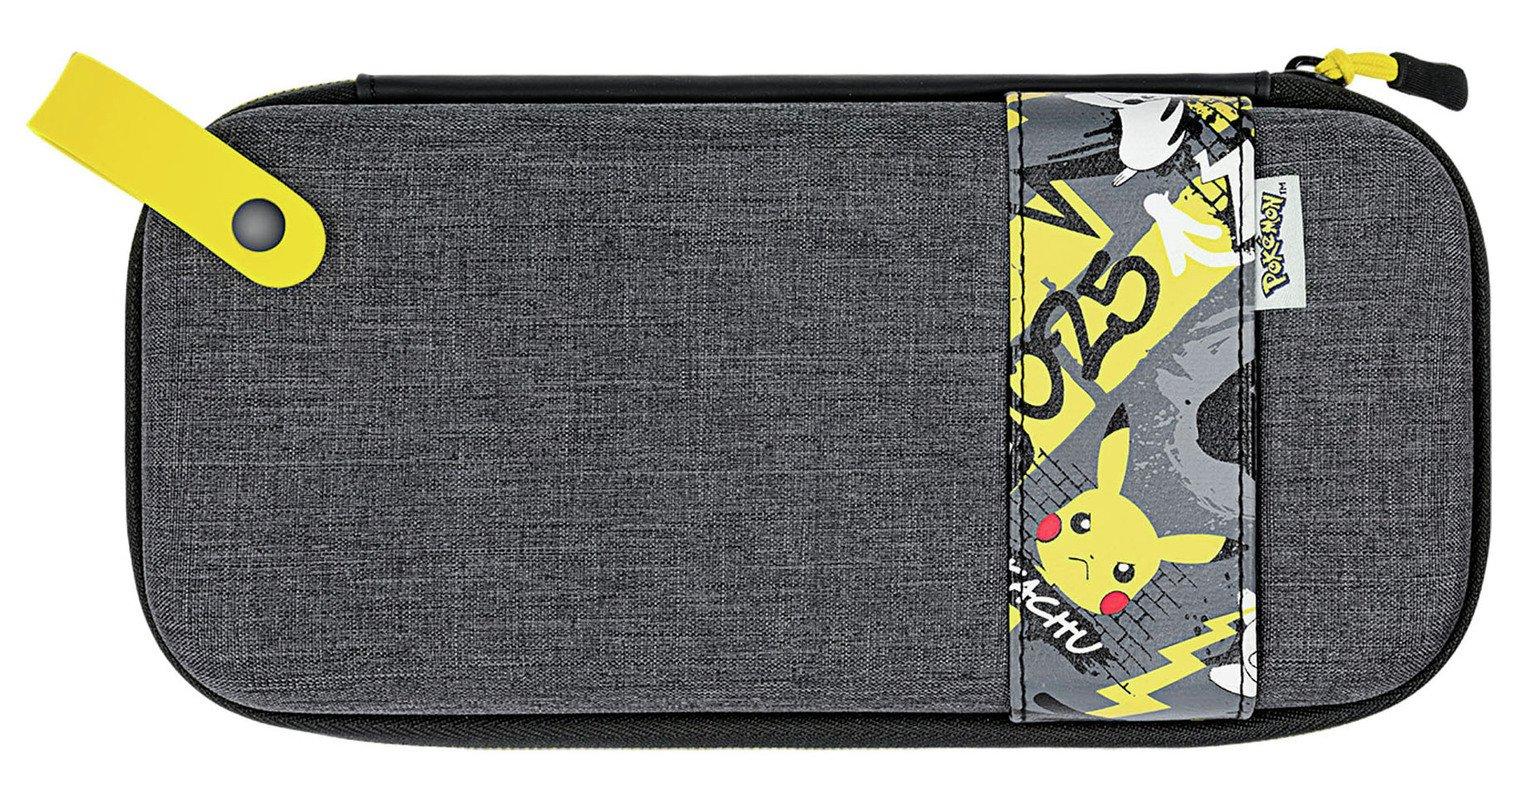 Nintendo Switch Pikachu Travel Case